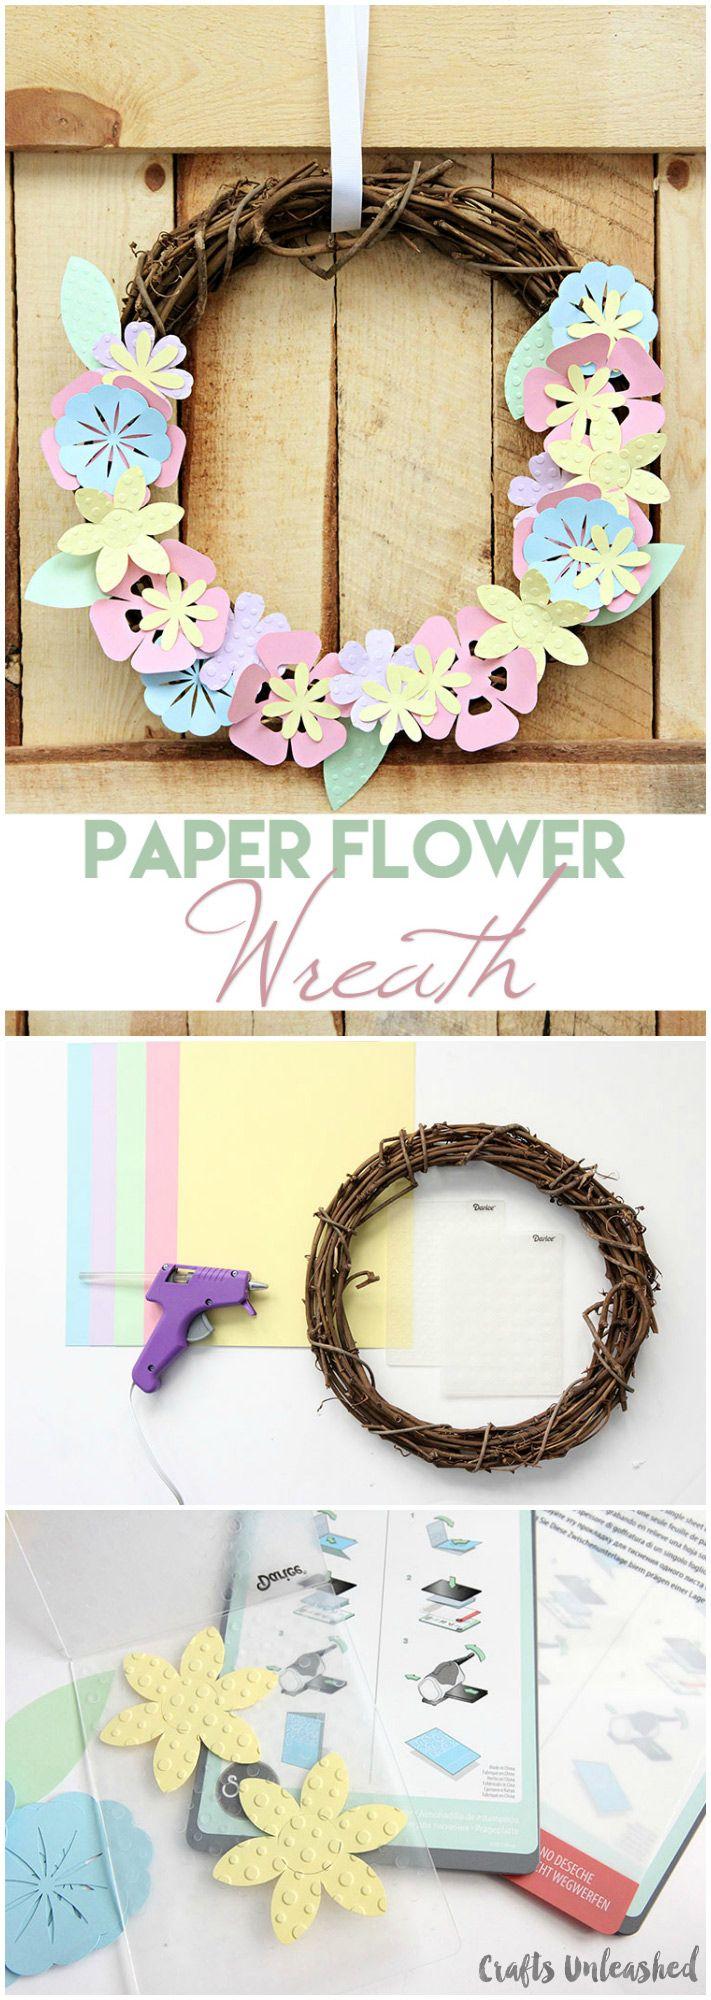 Diy paper flower wreath ruffled - Diy Paper Flower Wreath Spring Decor Consumer Crafts